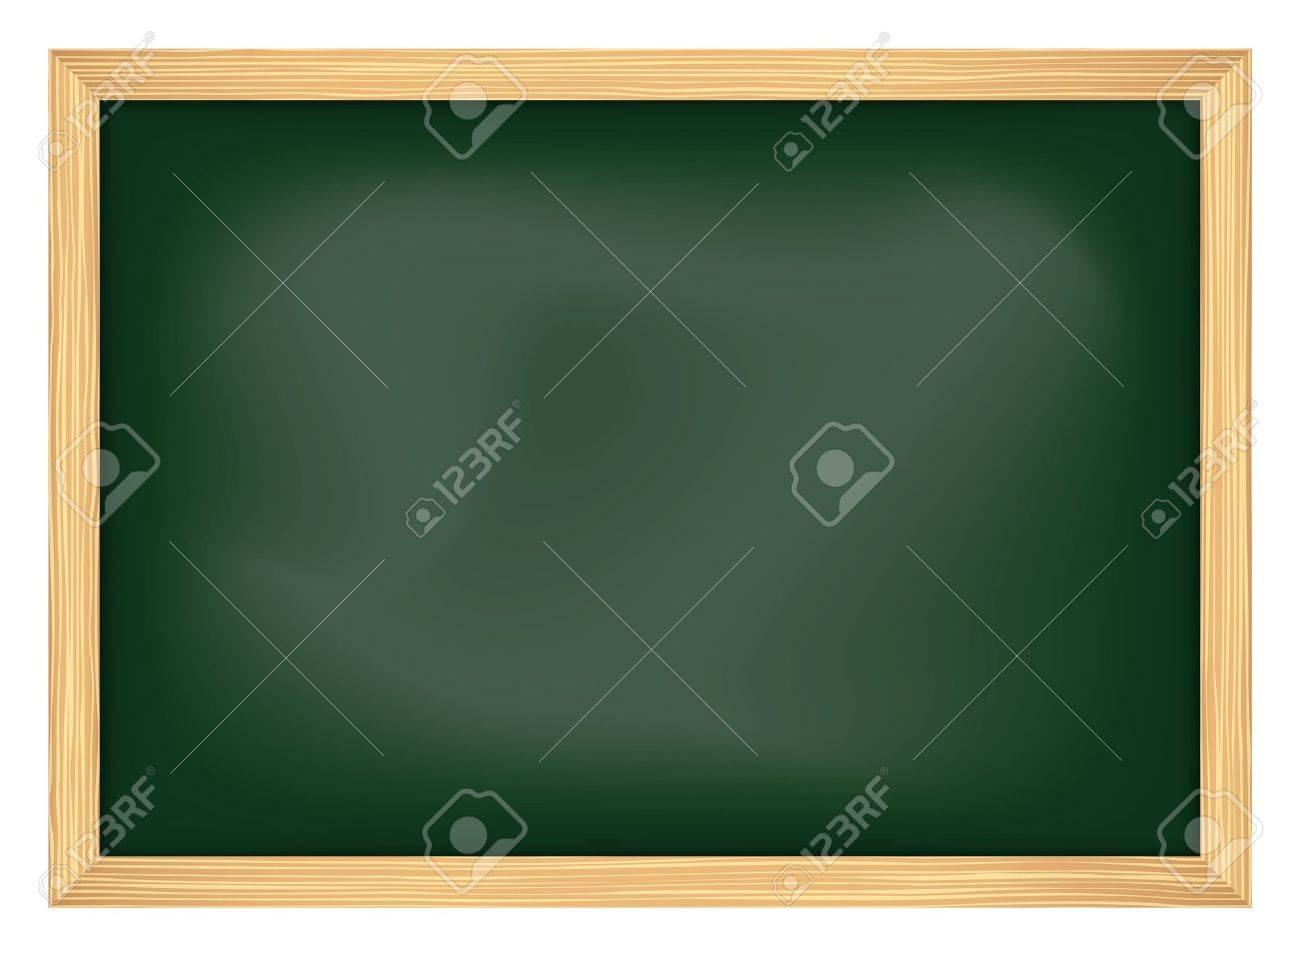 empty school chalkboard with frame - 14901729